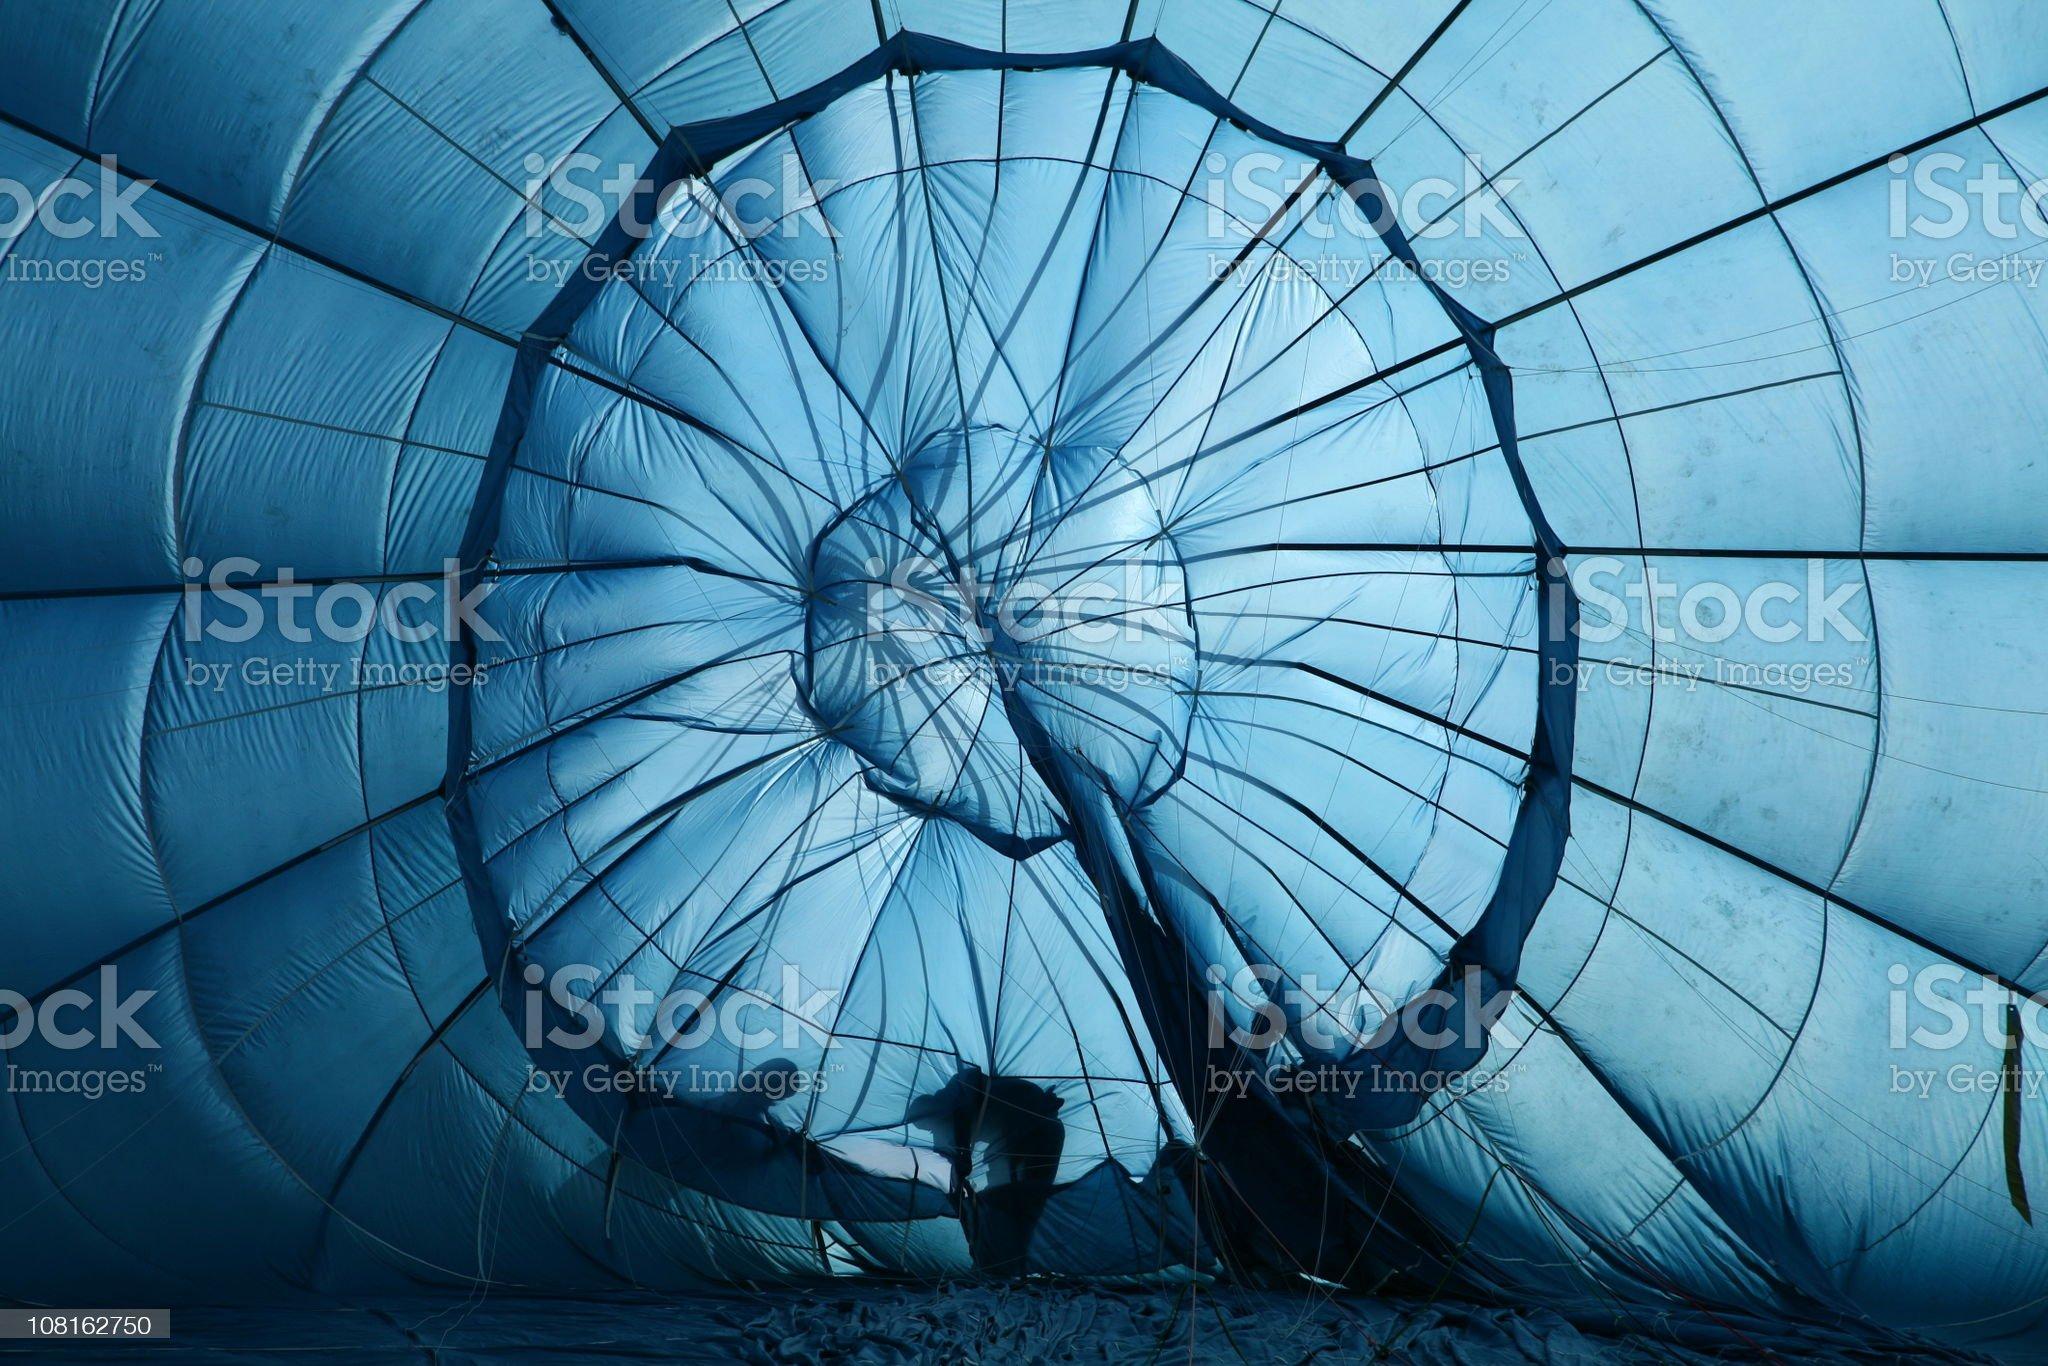 People assembling a hot air balloon royalty-free stock photo